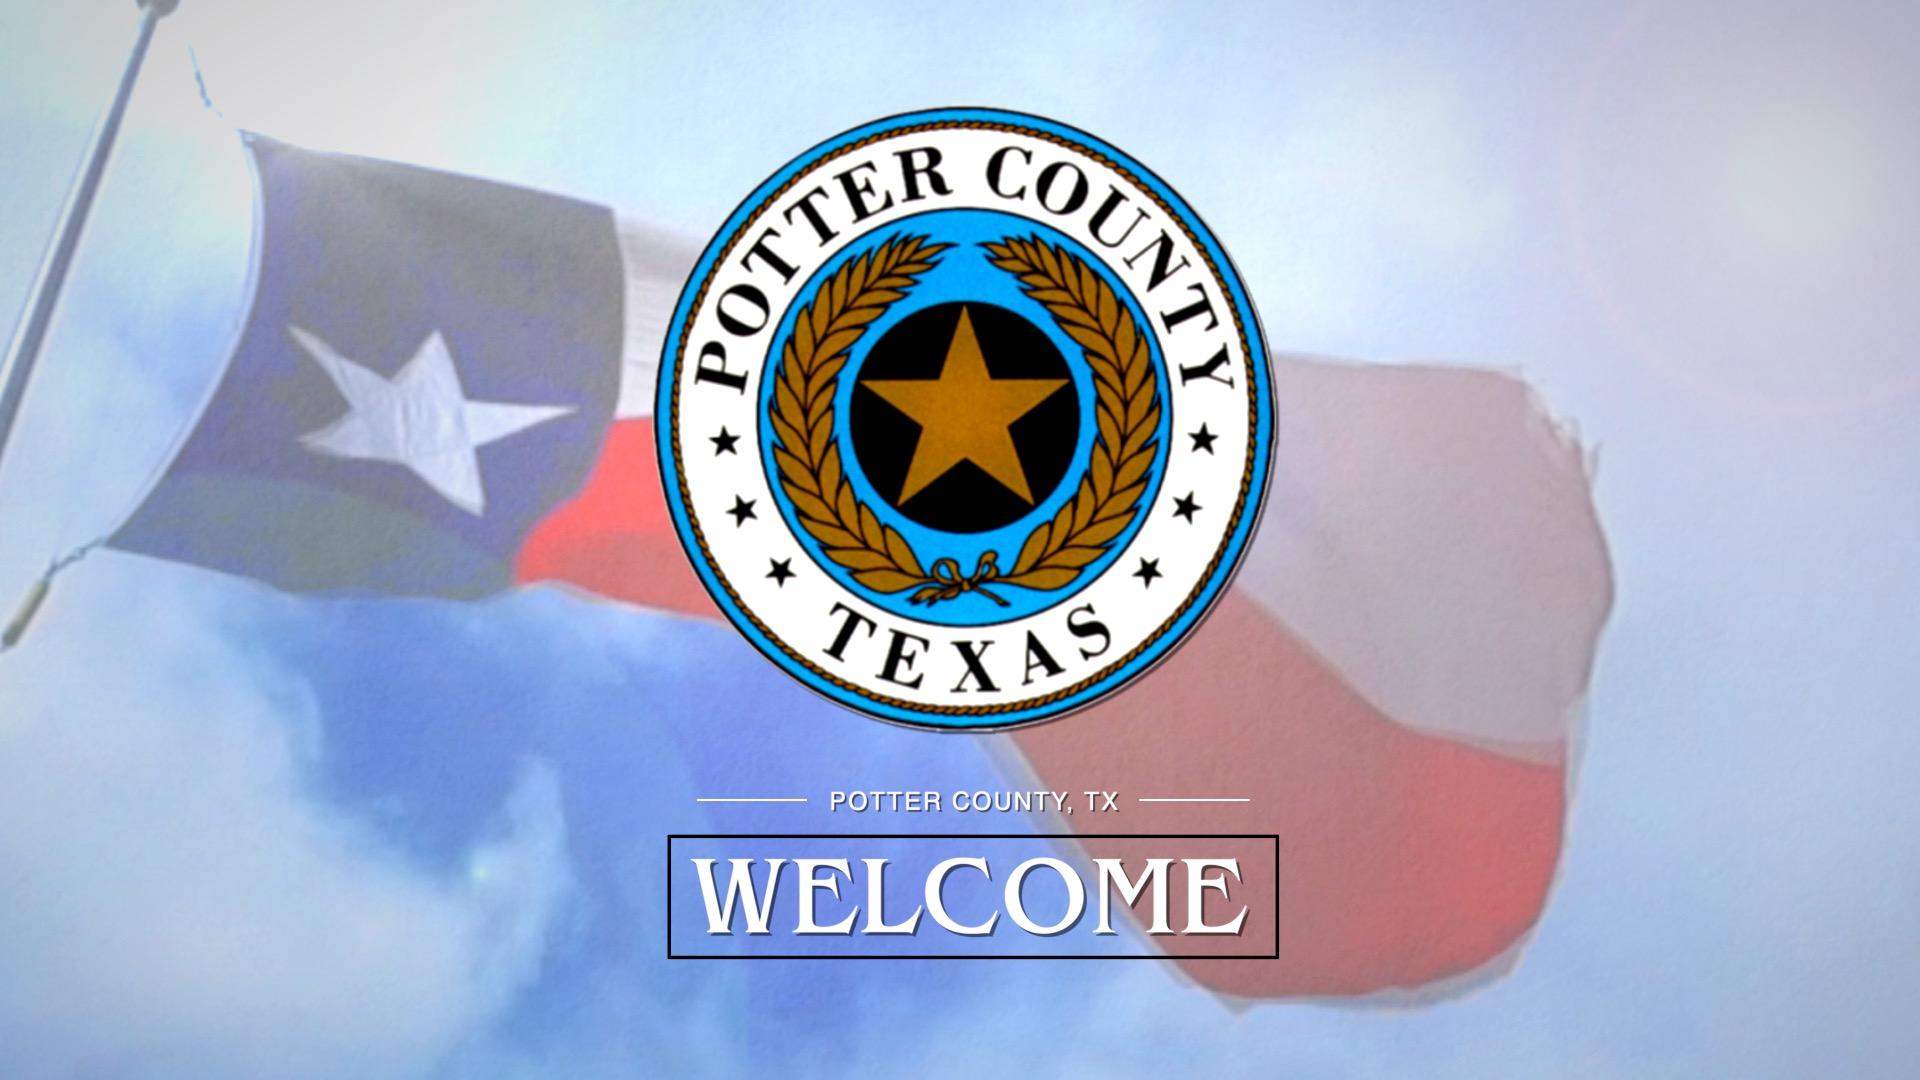 Potter County, Texas